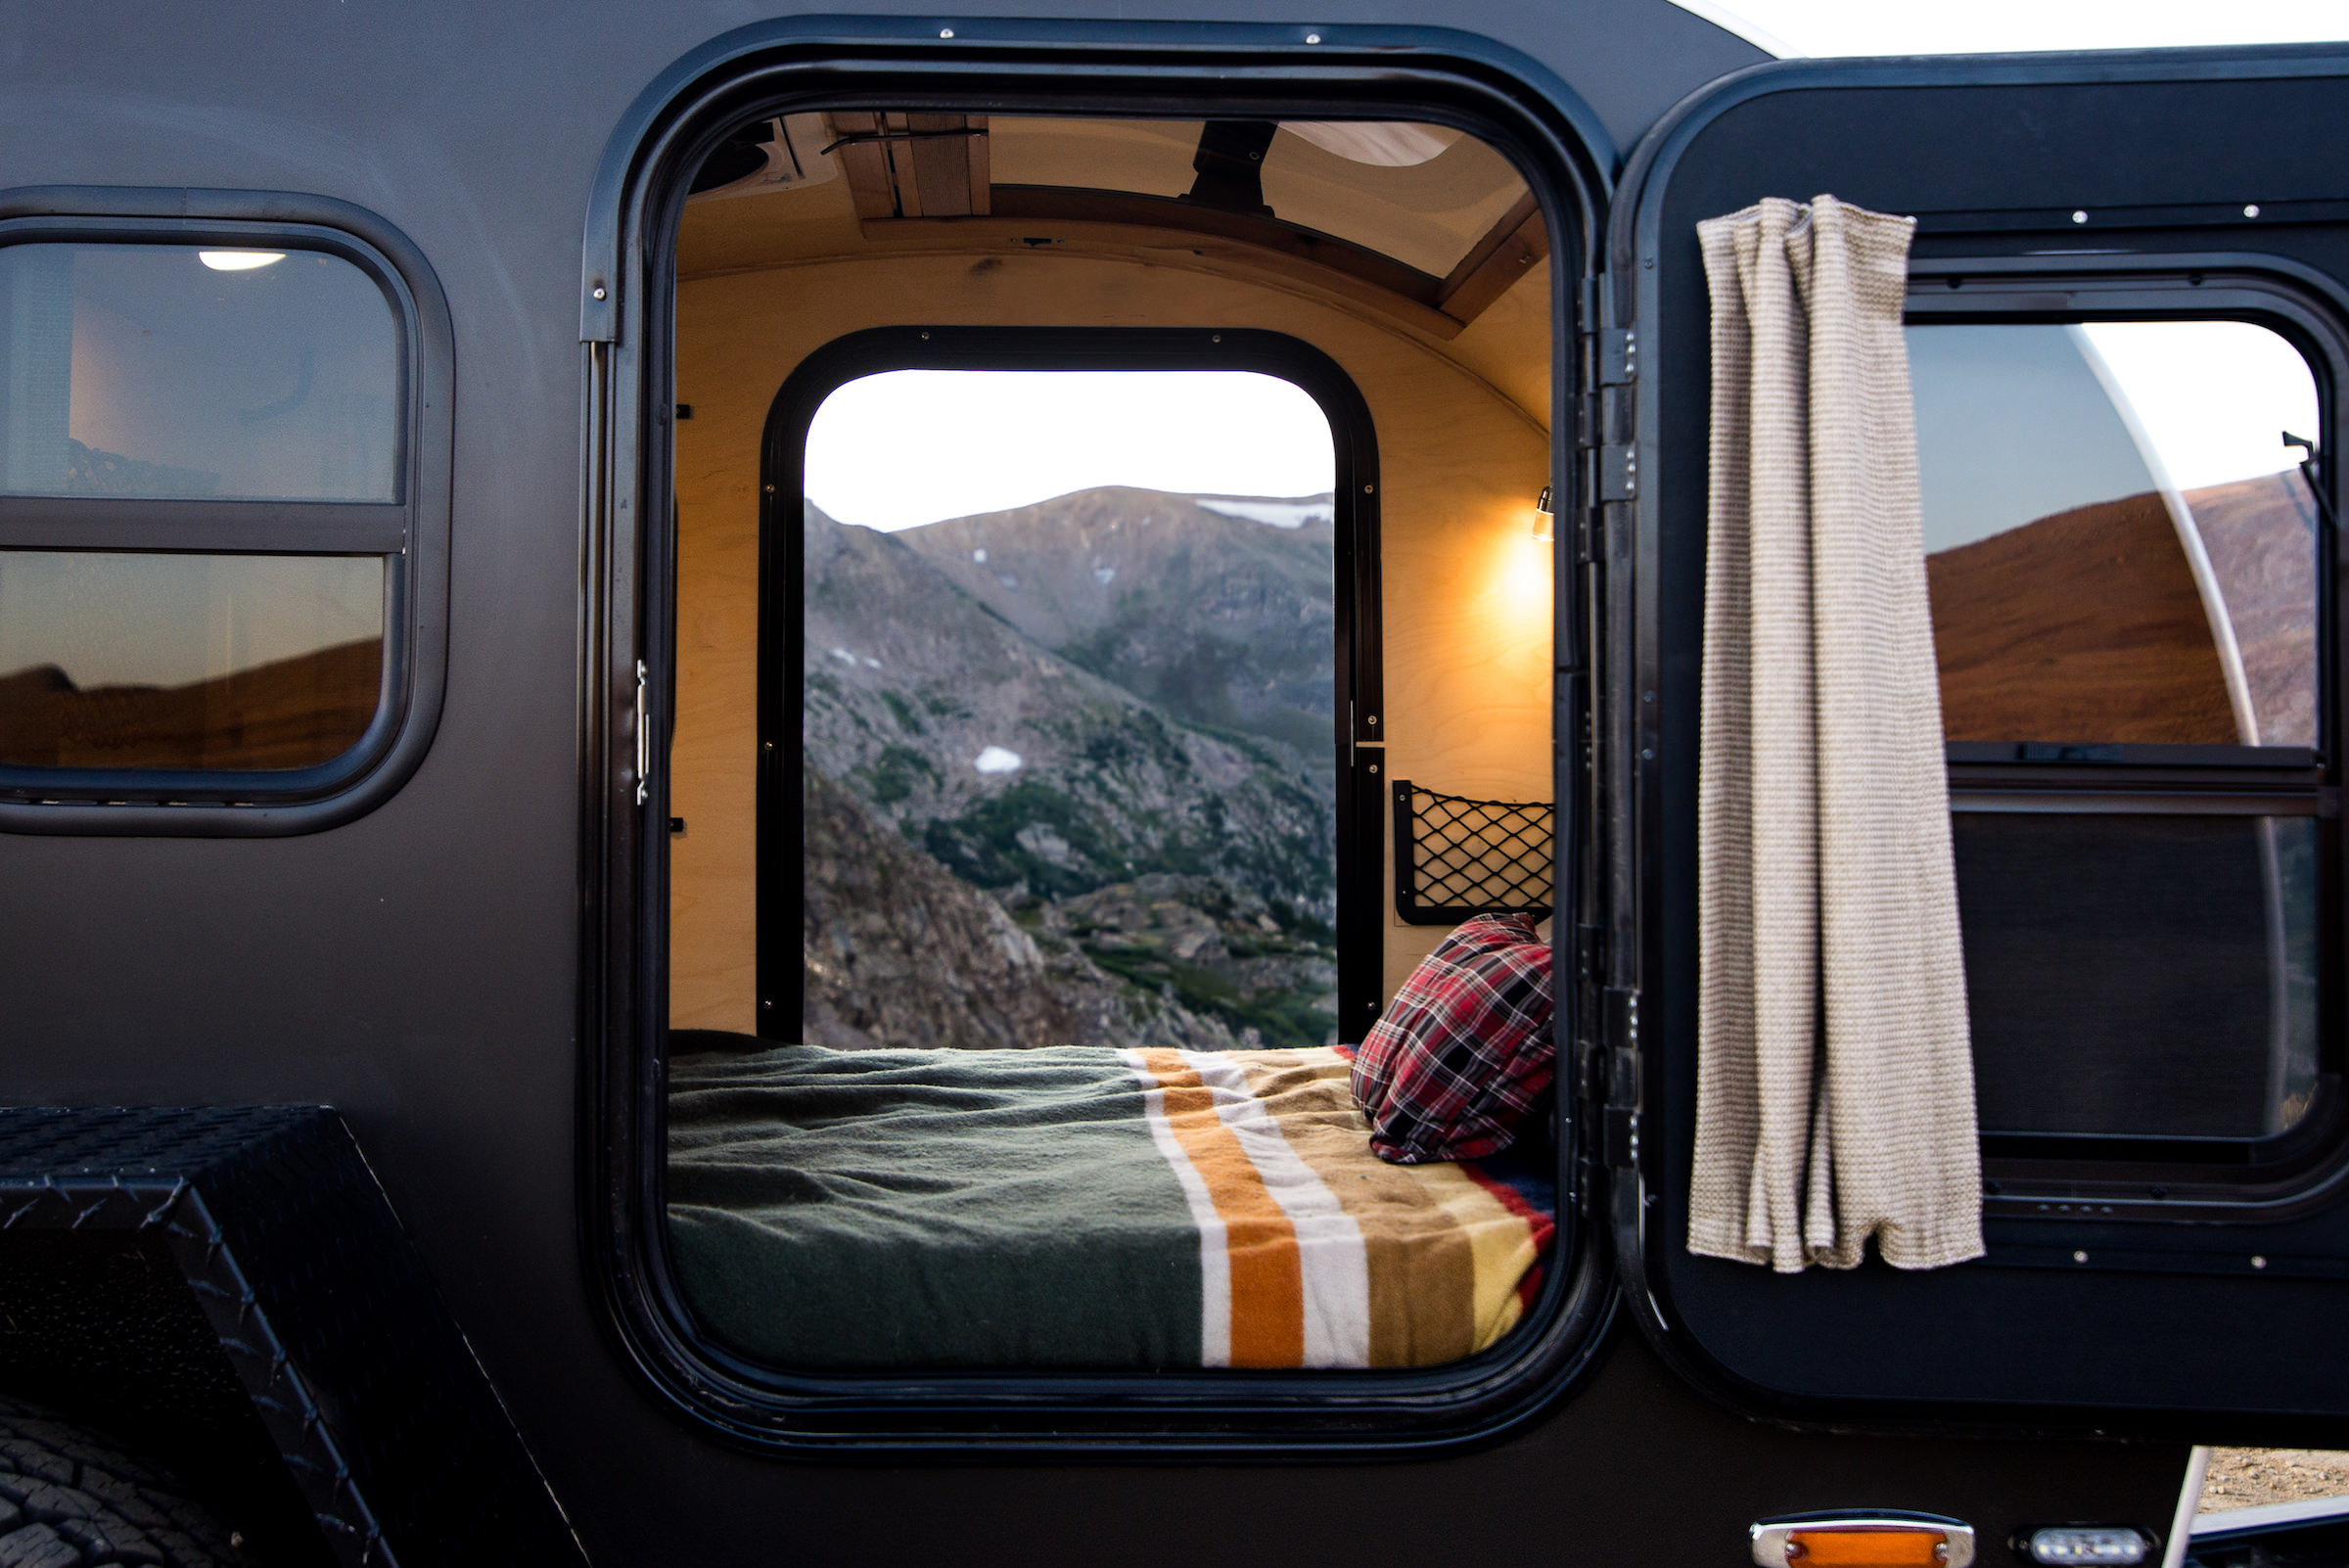 Timberleaf Pika Teardrop Camper Trailer Interior 2